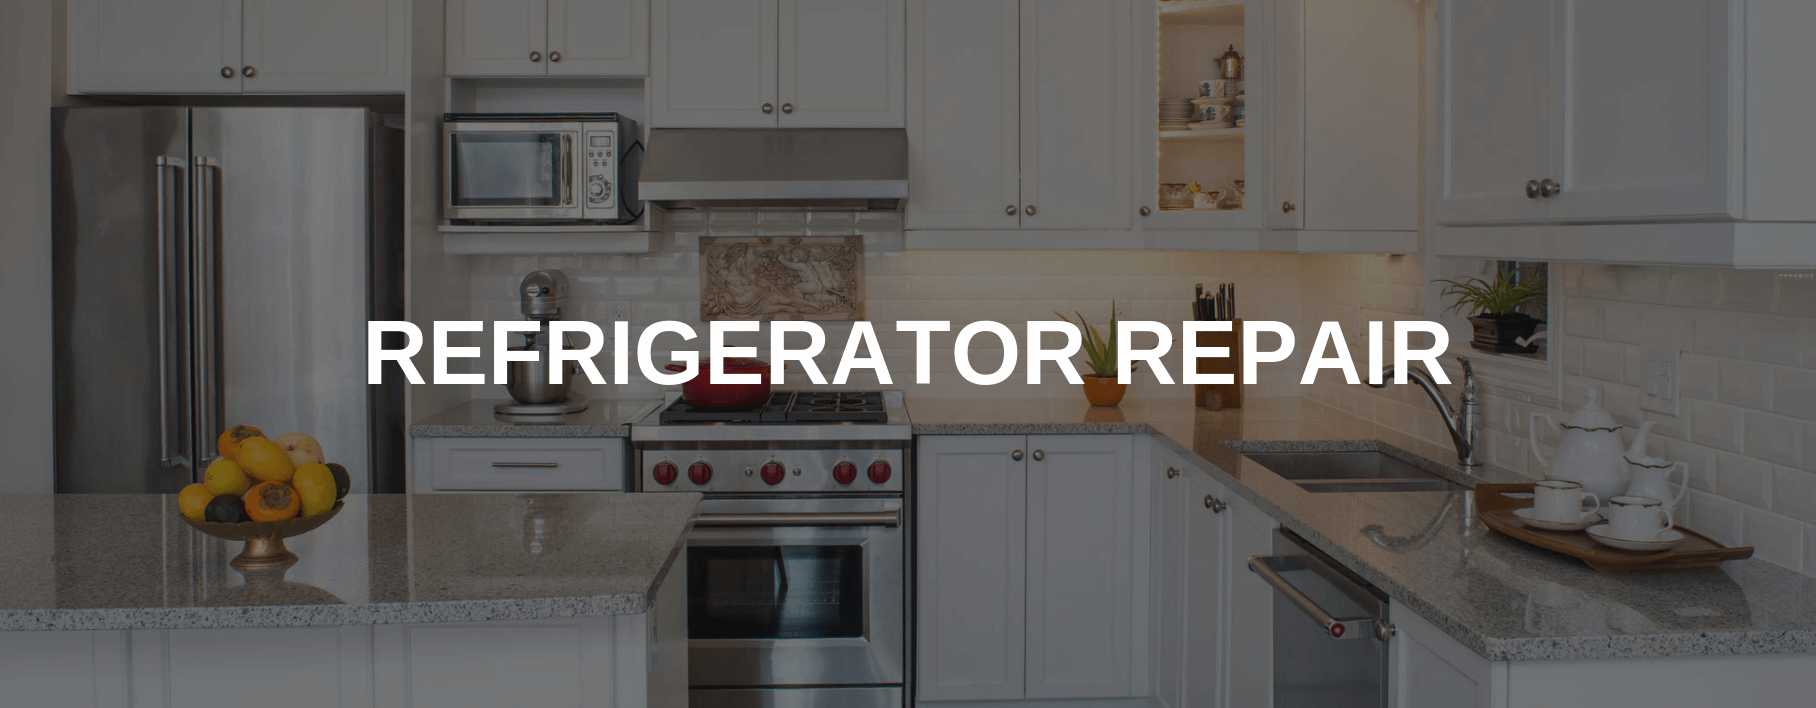 refrigerator repair Branford